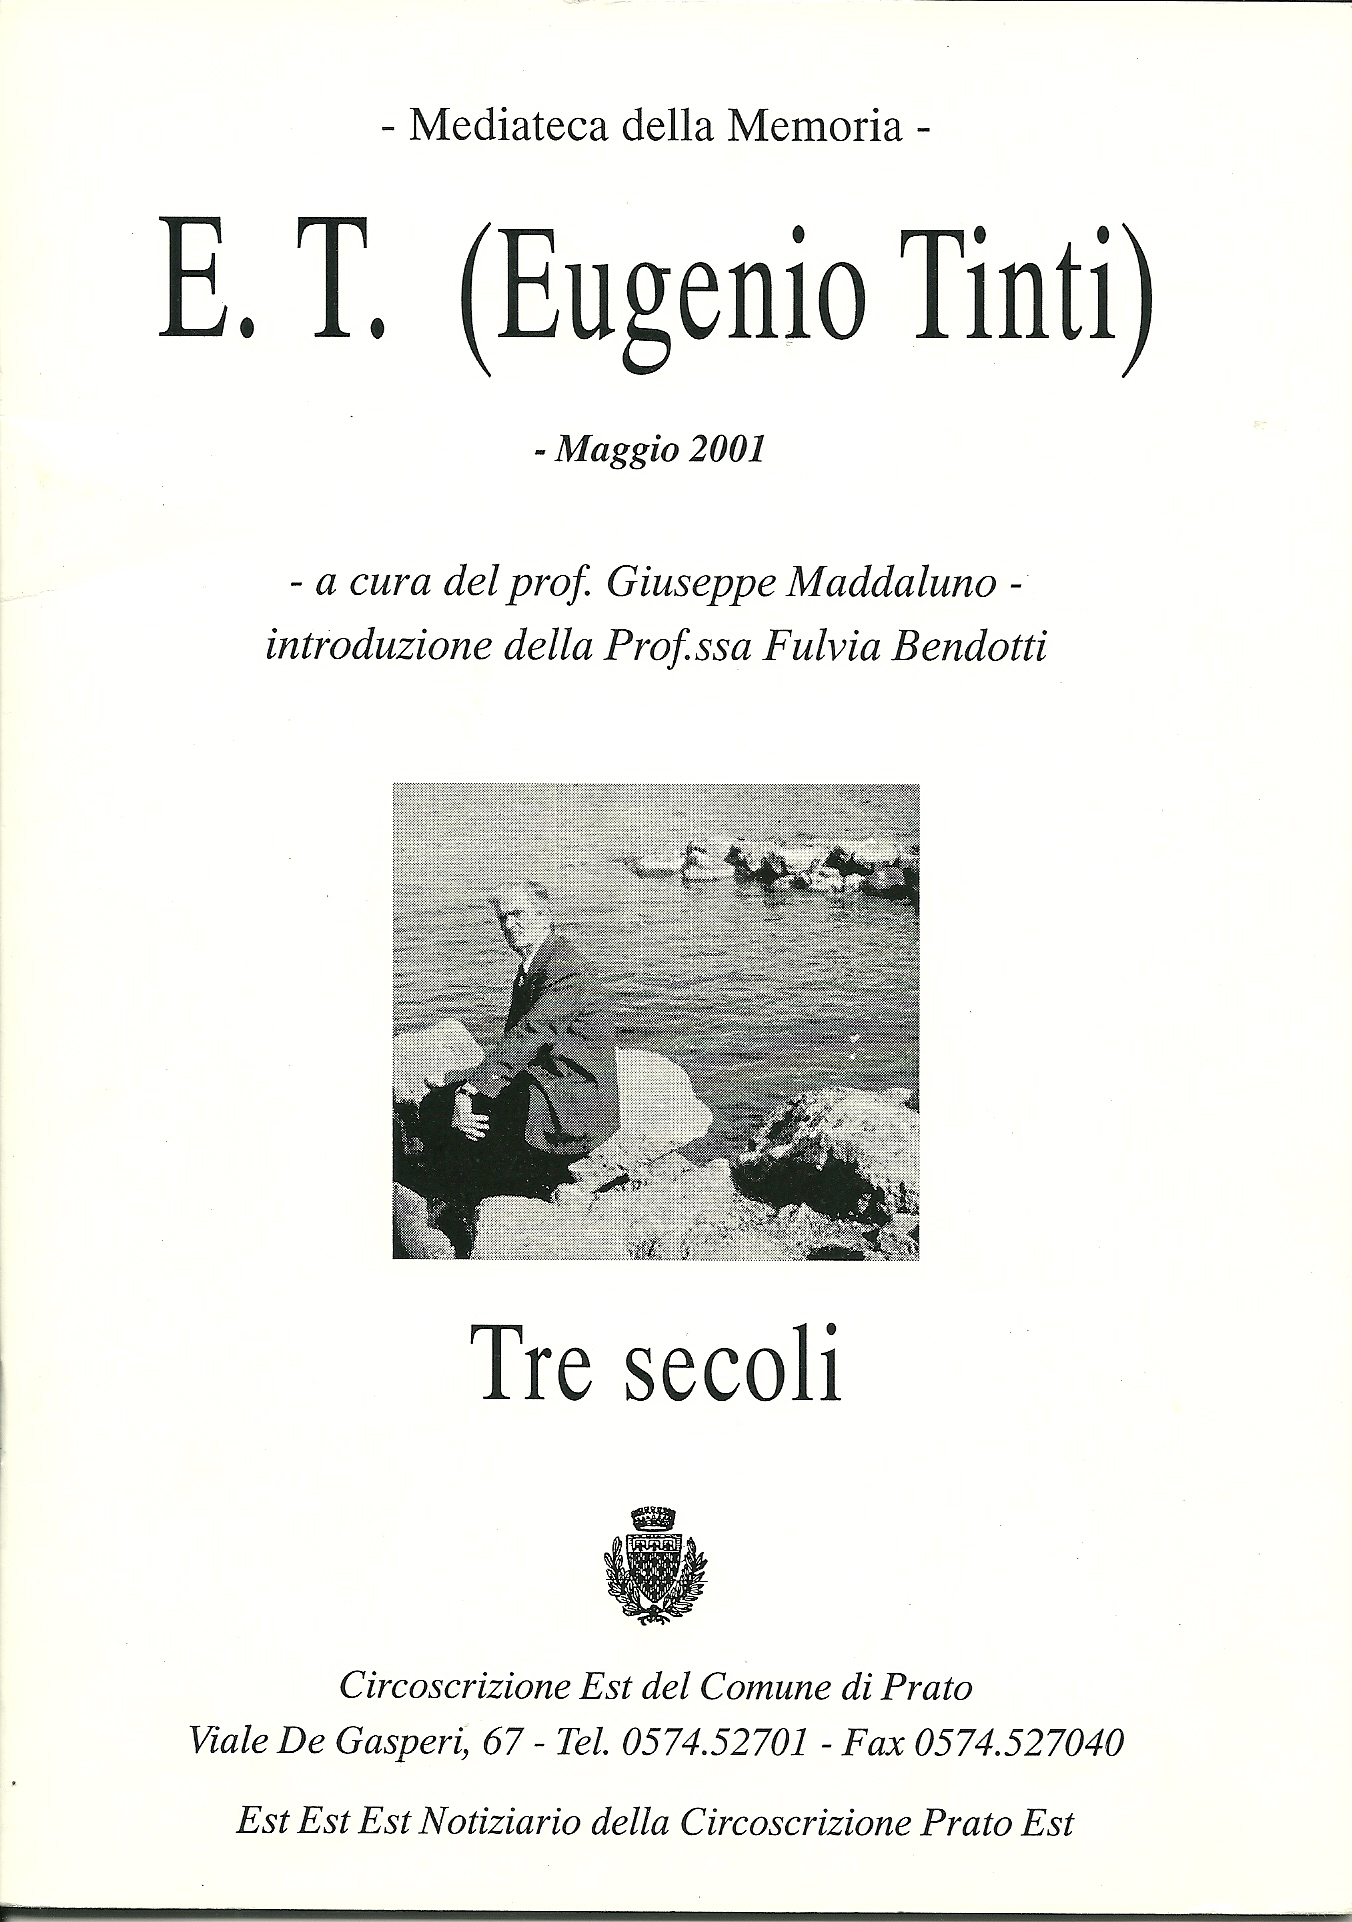 E. T. (Eugenio Tinti) Tre secoli